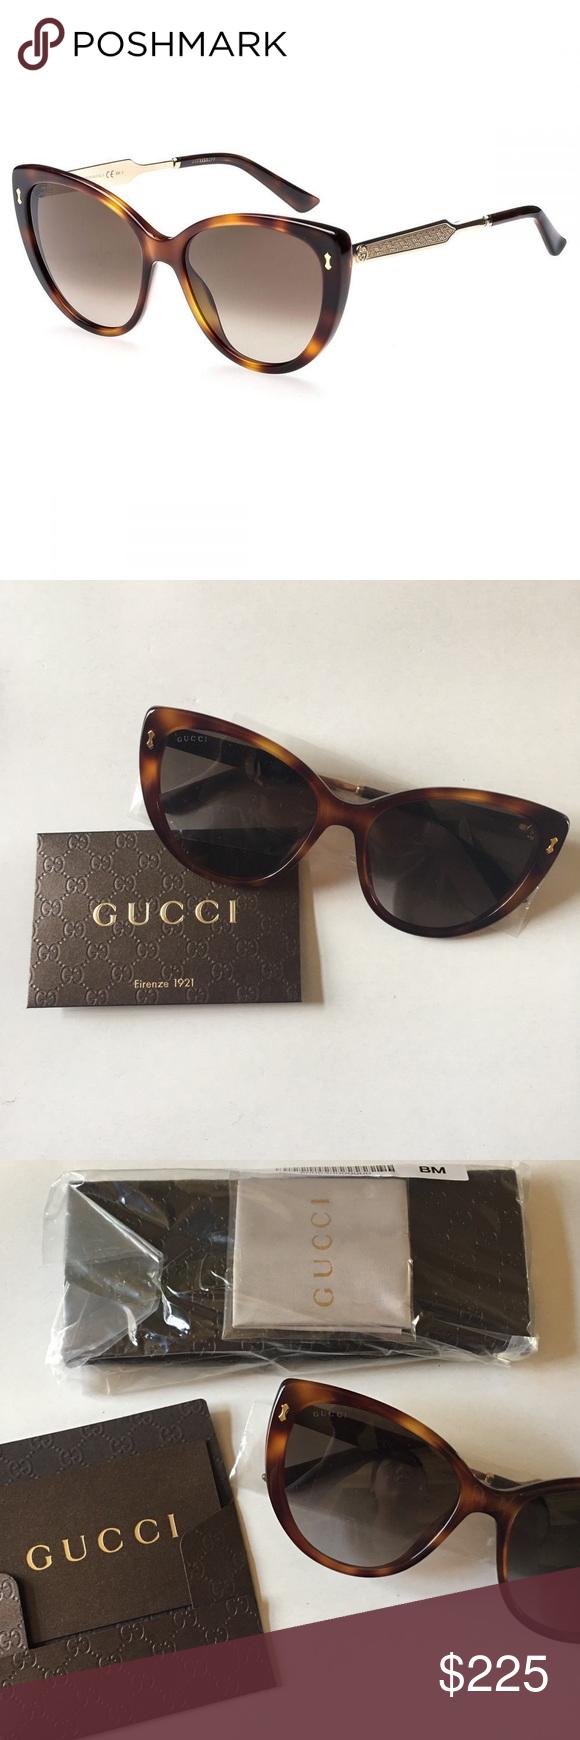 d9cb159ba507e Gucci Havana Cat Eye Sunglasses +Brand new with tag +No scratches